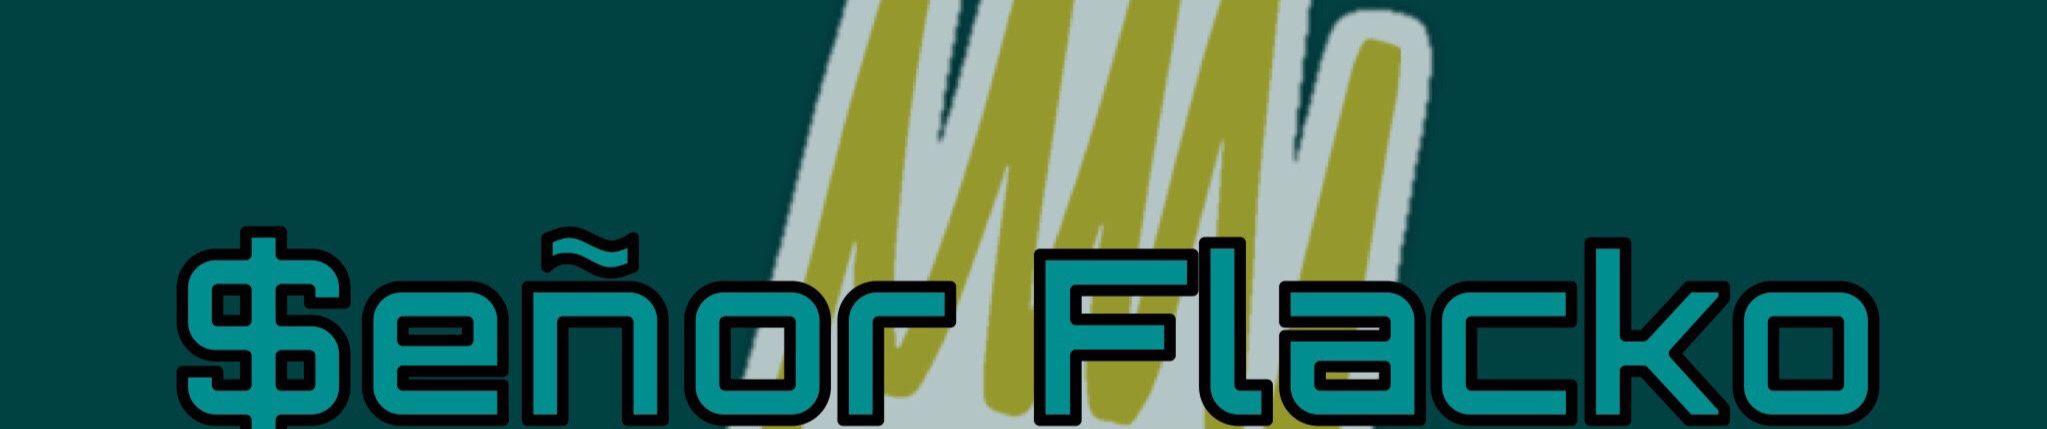 d8d59dcba03acd Bobe  X Senor Flacko -Gucci Flip Flops (GGF) by  enor Flacko